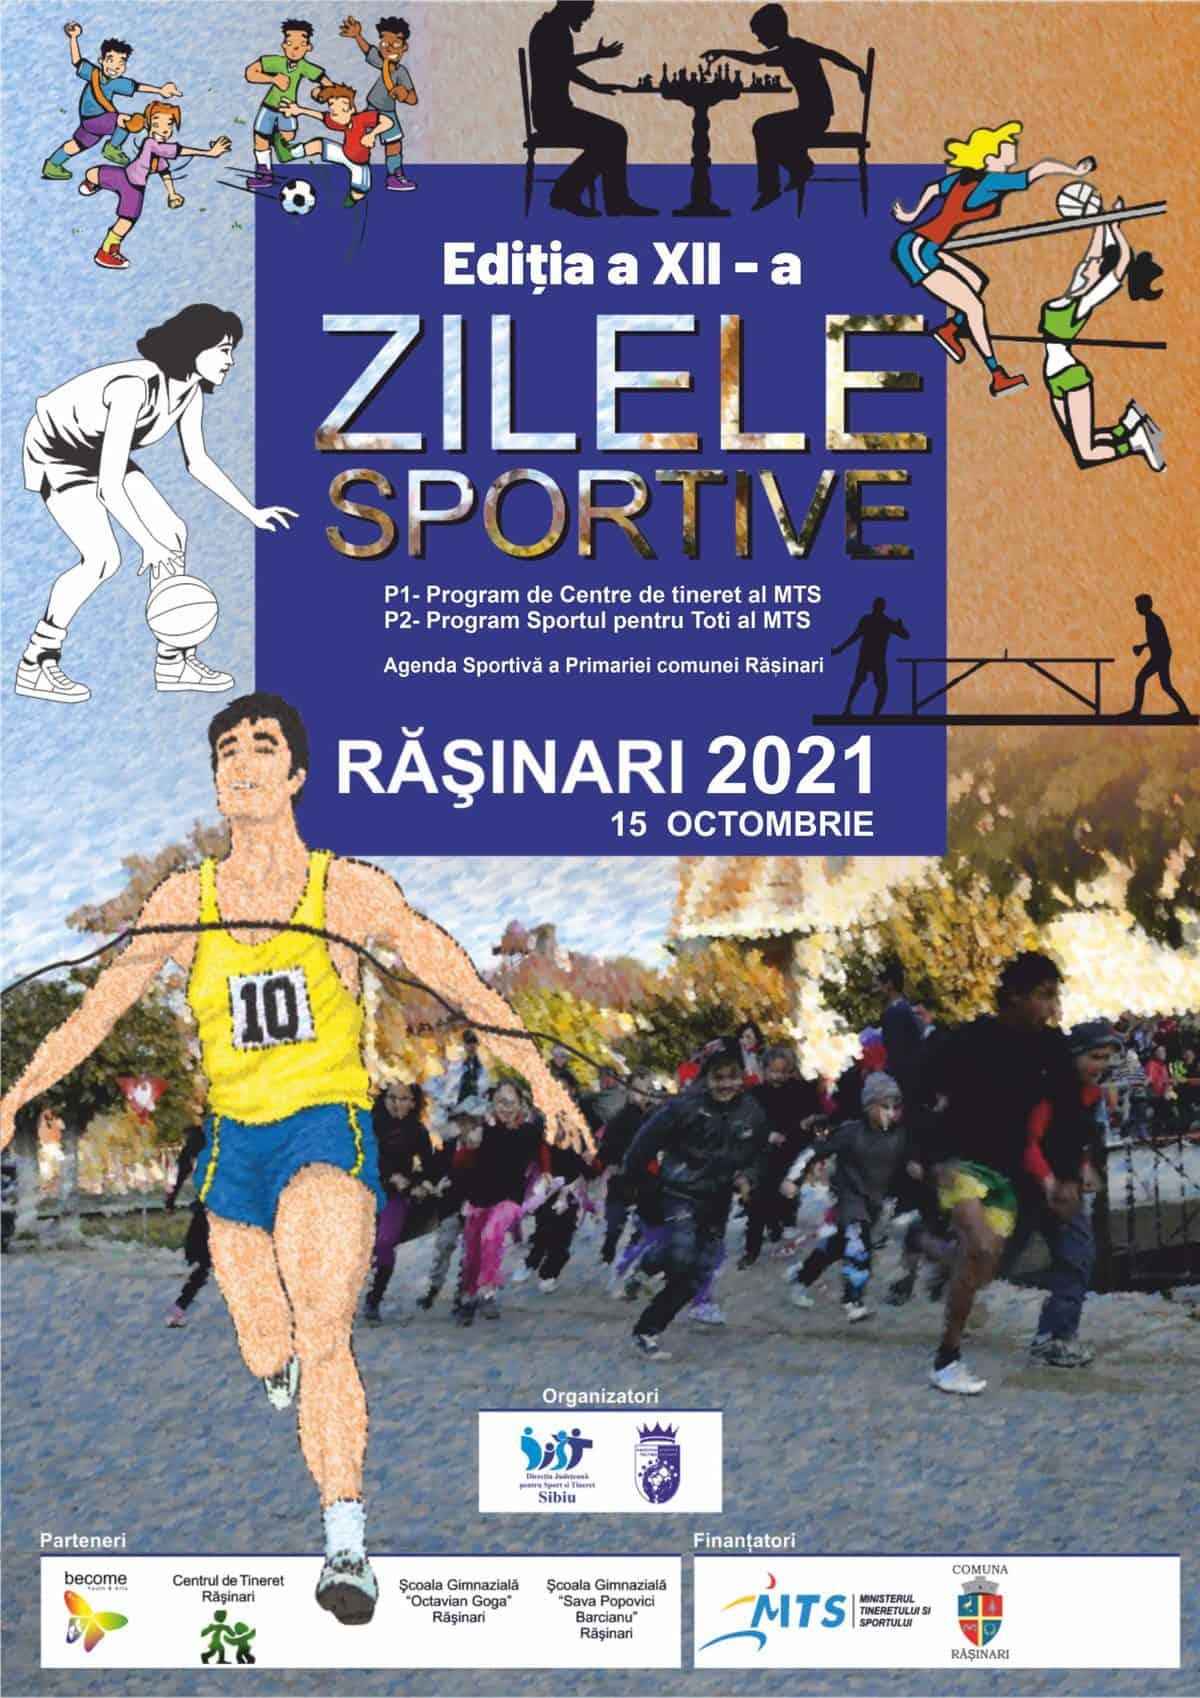 AFIS ZILELE SPORTIVE RASINARI 2021 scaled